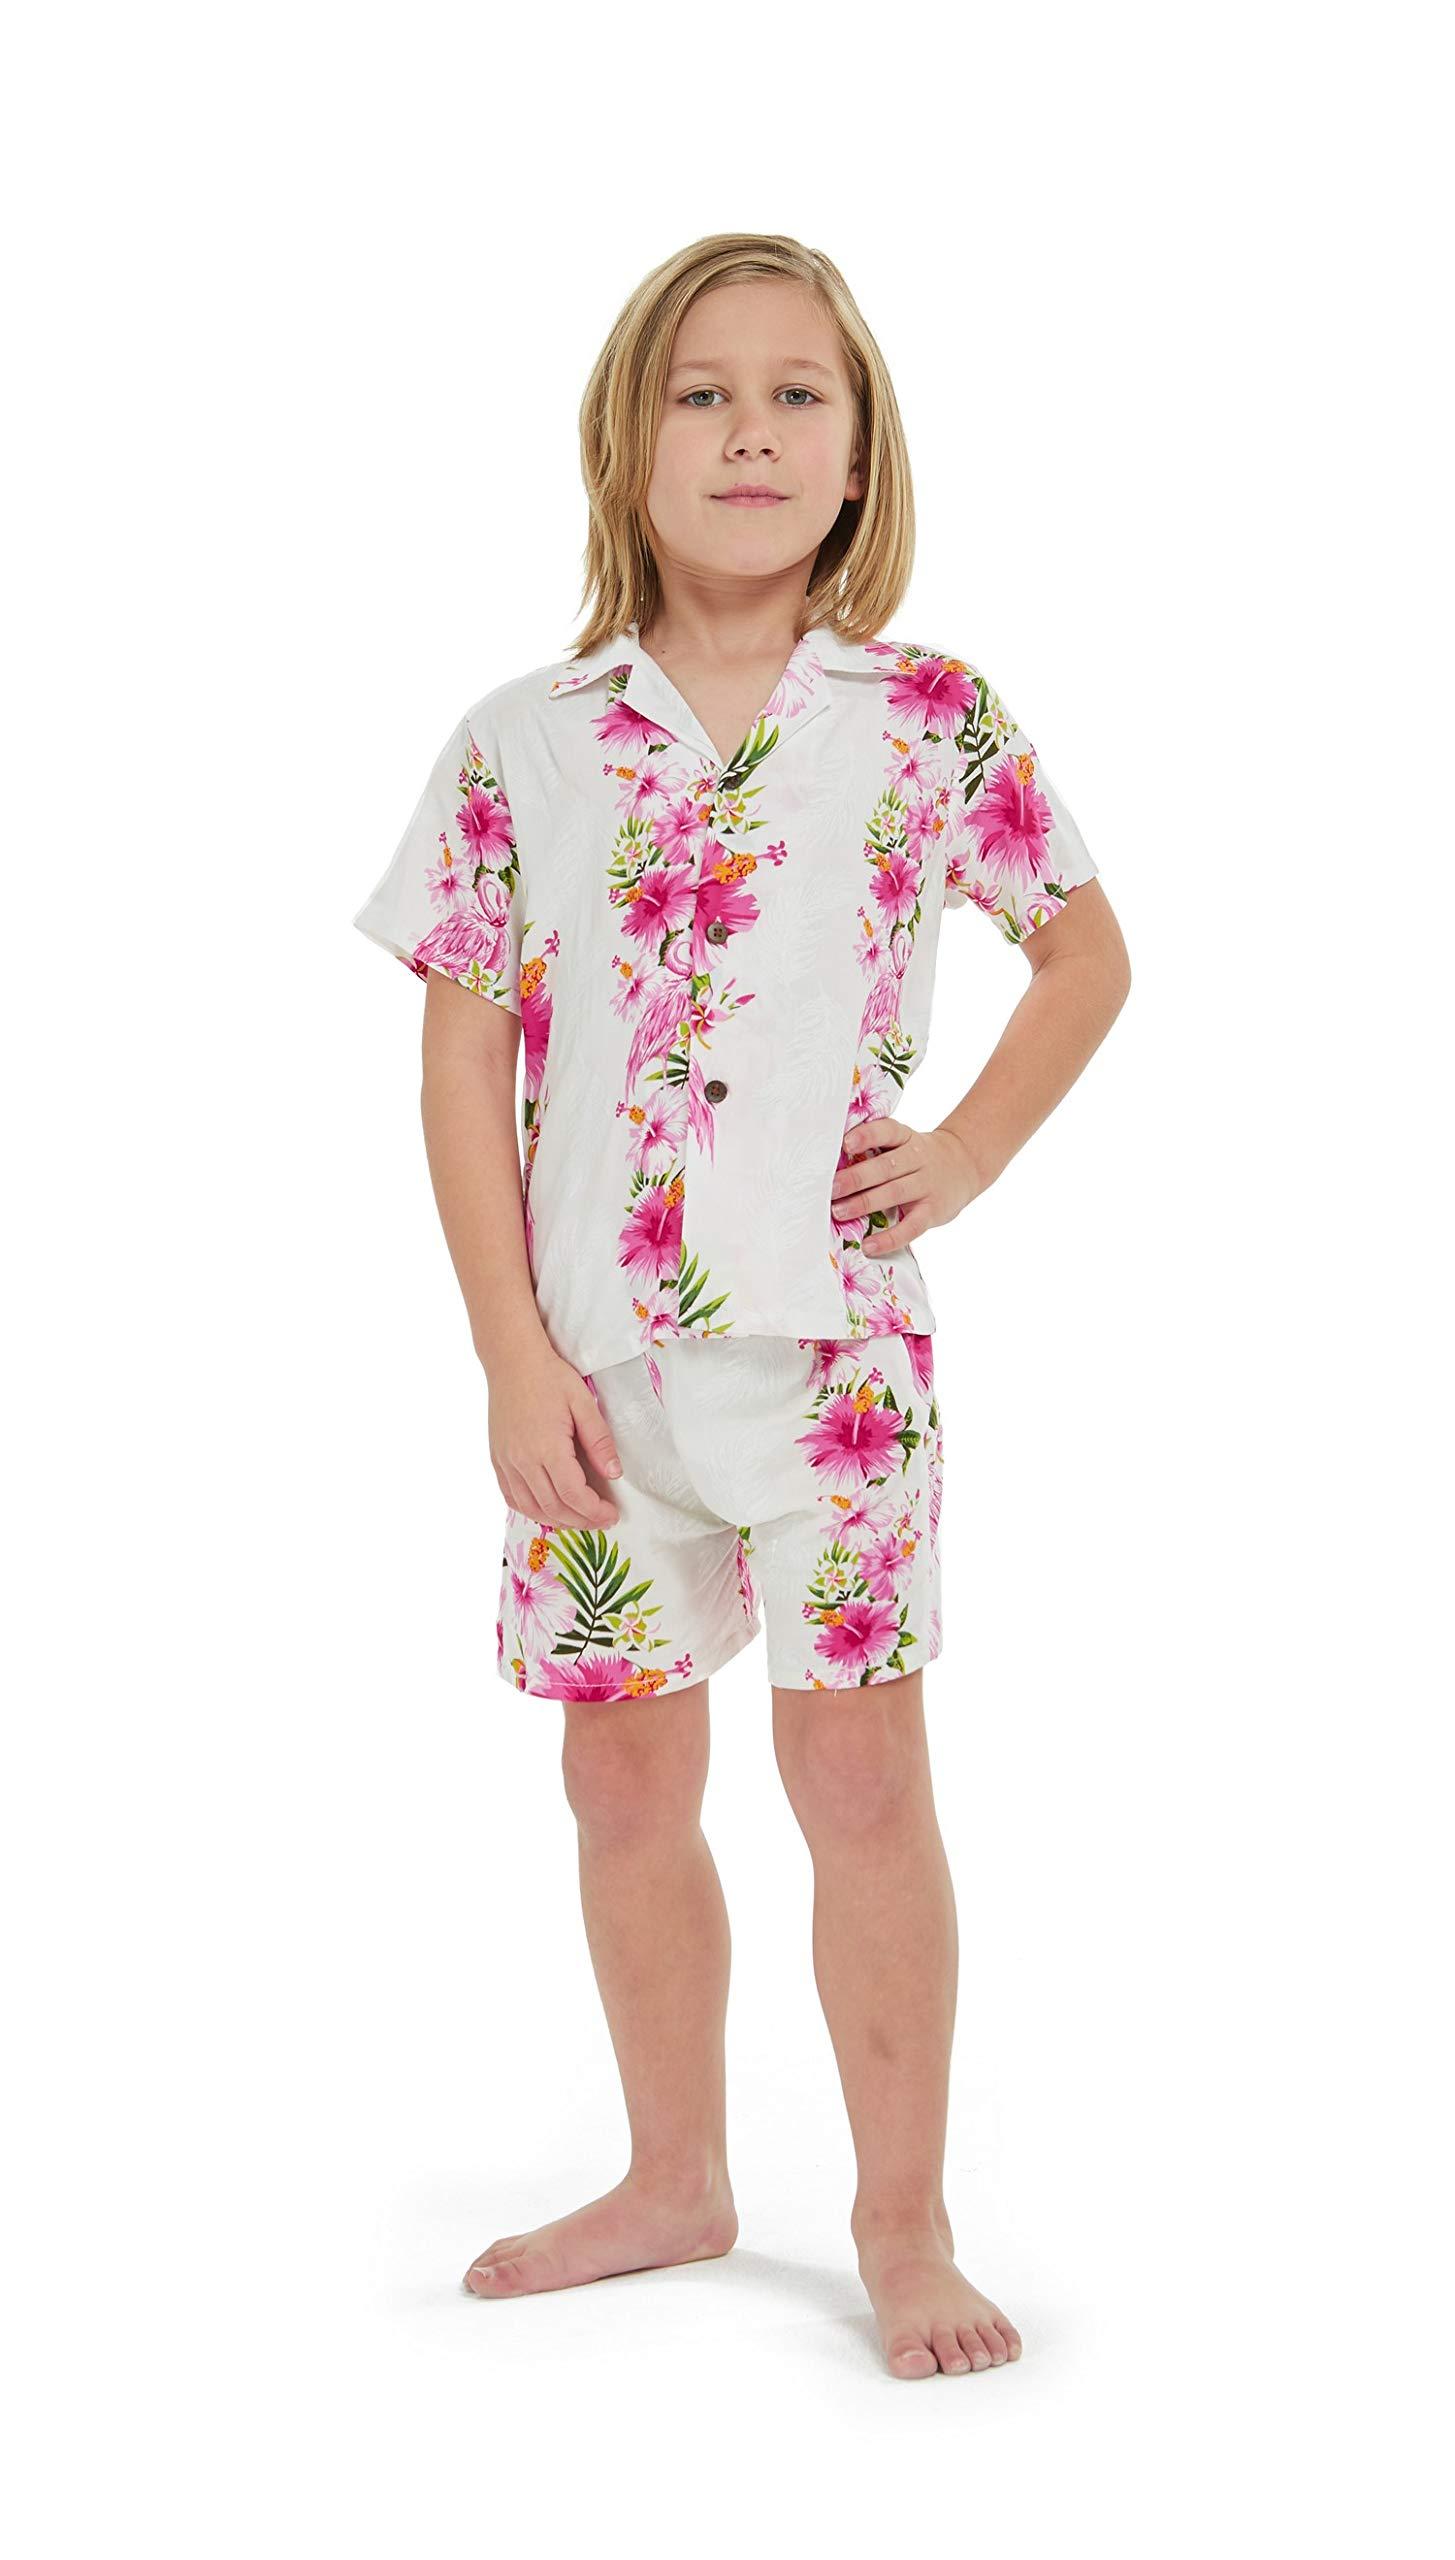 Hawaii Hangover Boy Young Adult Aloha Luau Shirt in Pink Hibiscus Vine 10 Year Old by Hawaii Hangover (Image #4)